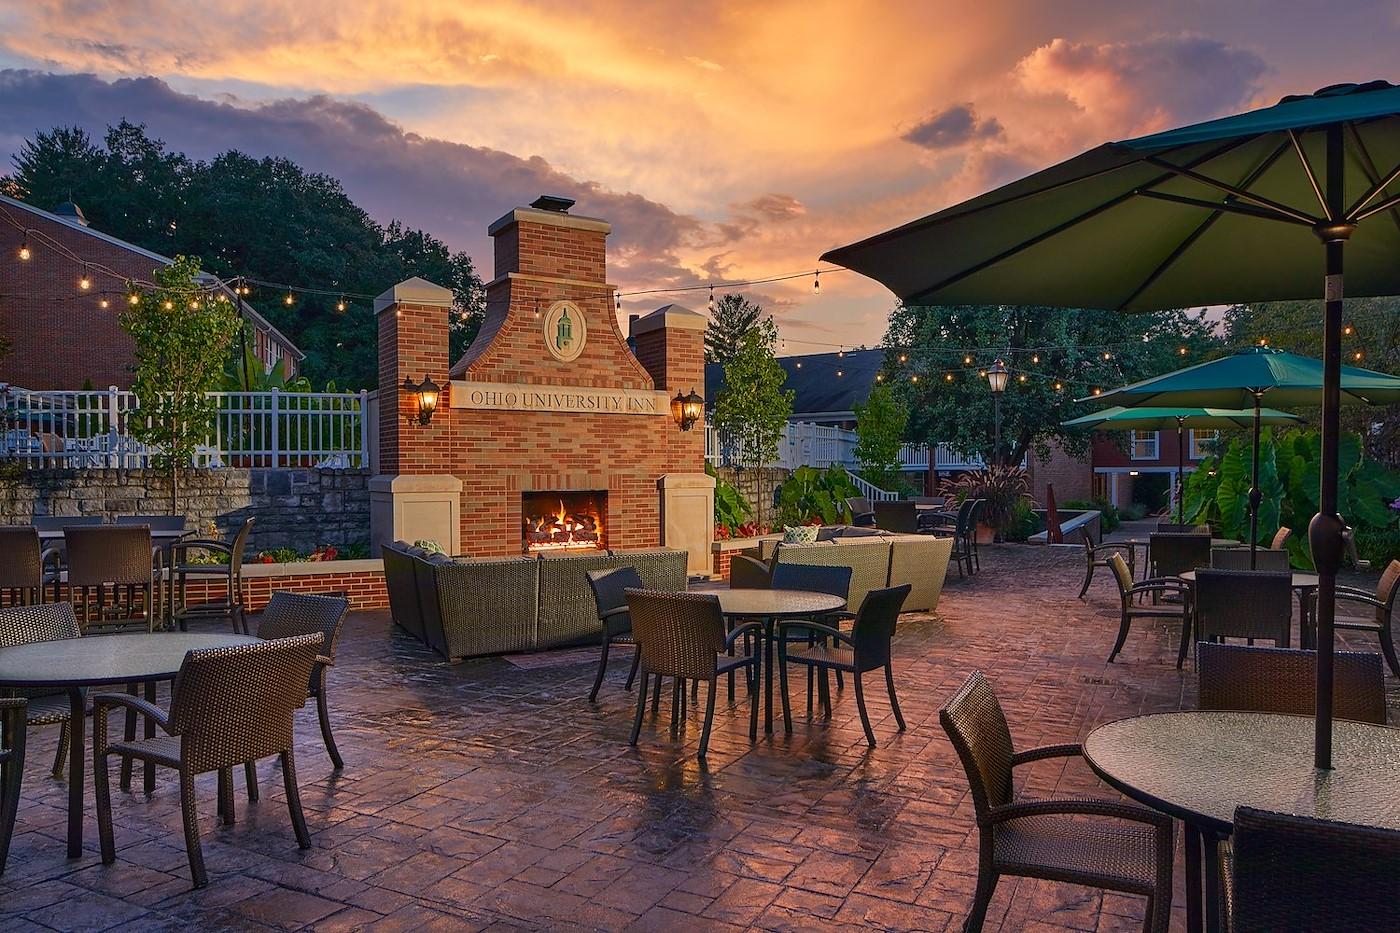 Cutler's romantic ambience on the campus of Ohio University Inn